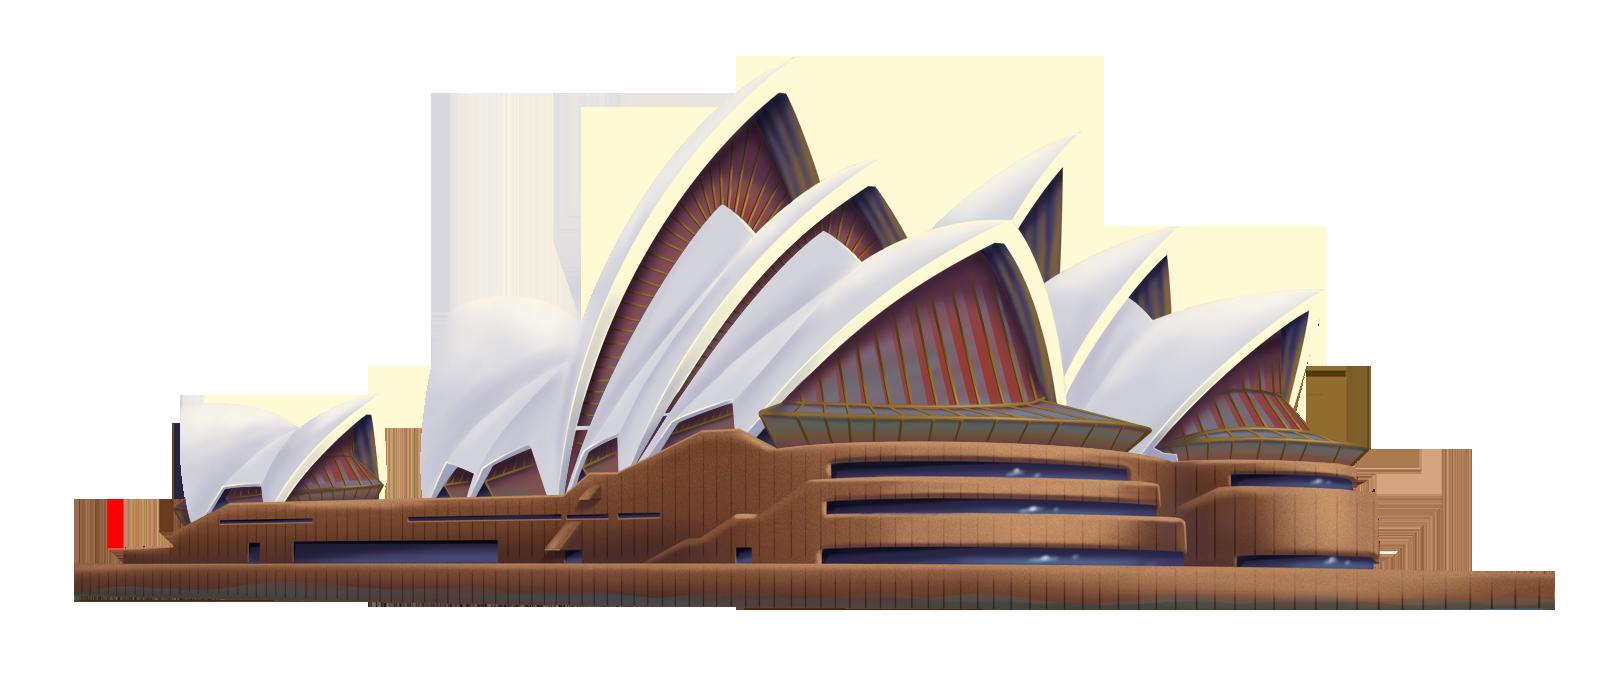 Interc mbio na austr lia australia brazil phd exchange for House trade in program